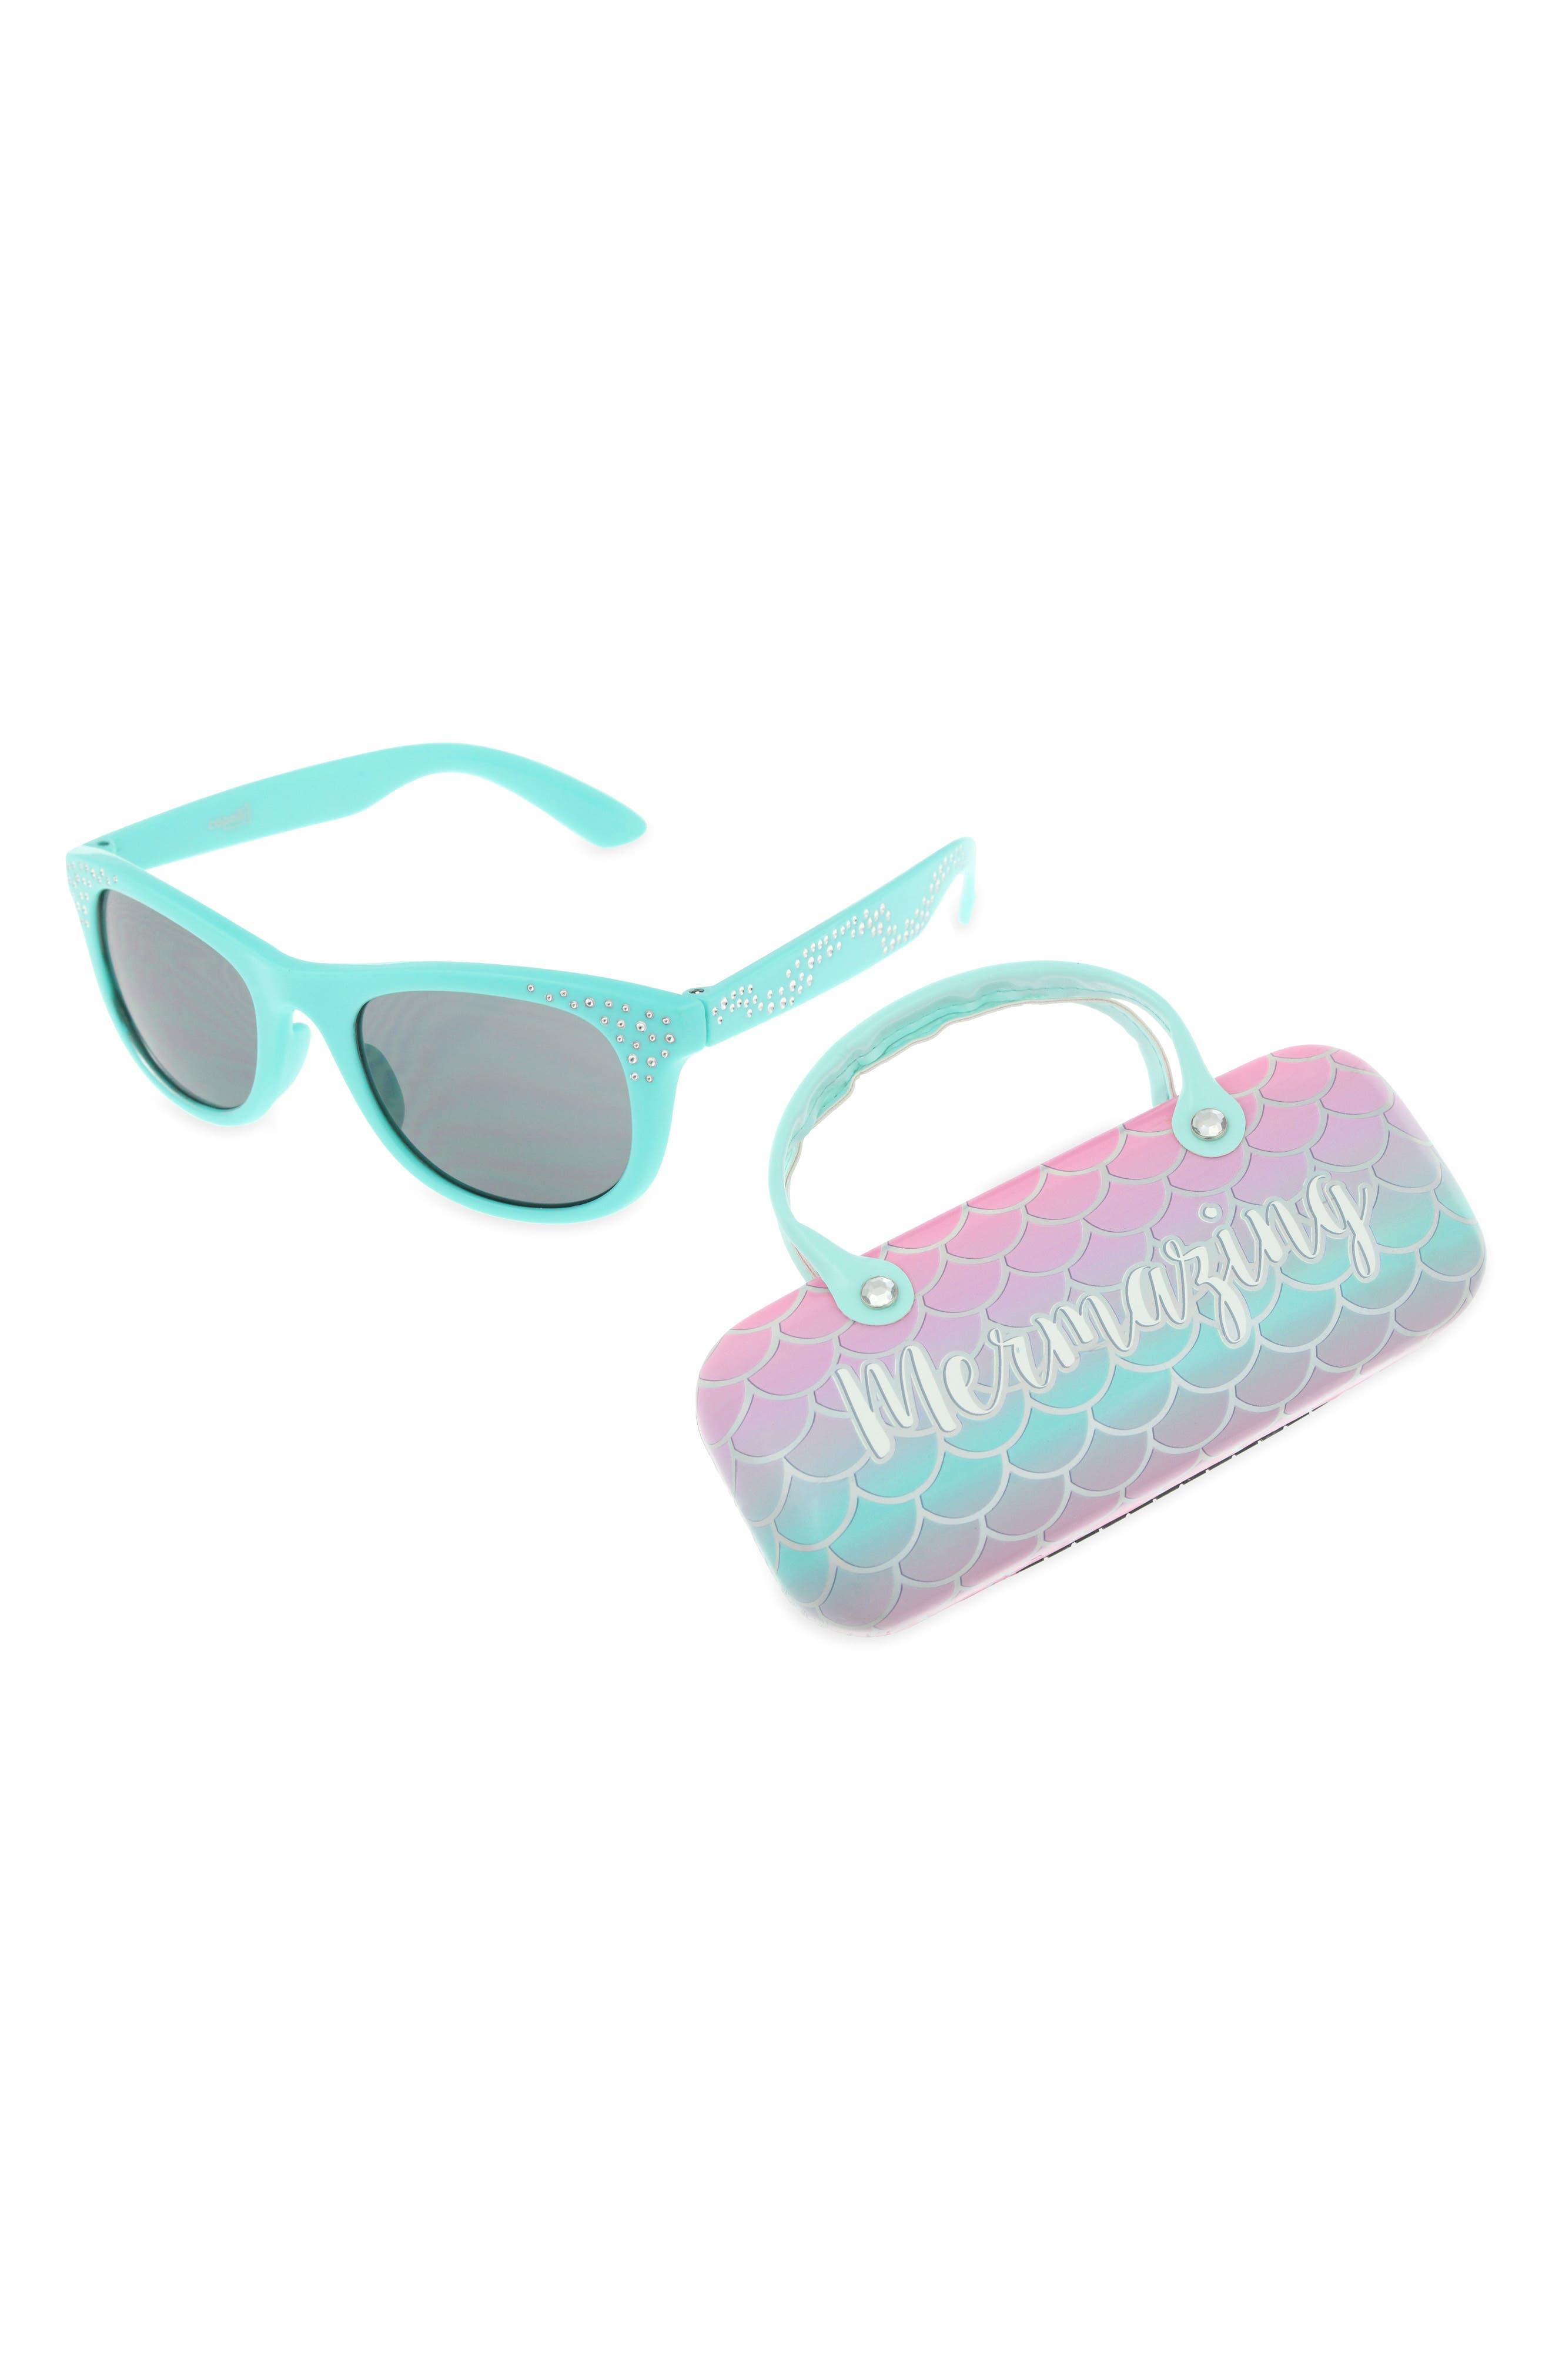 Mermazing 60mm Sunglasses & Case Set,                         Main,                         color, 338